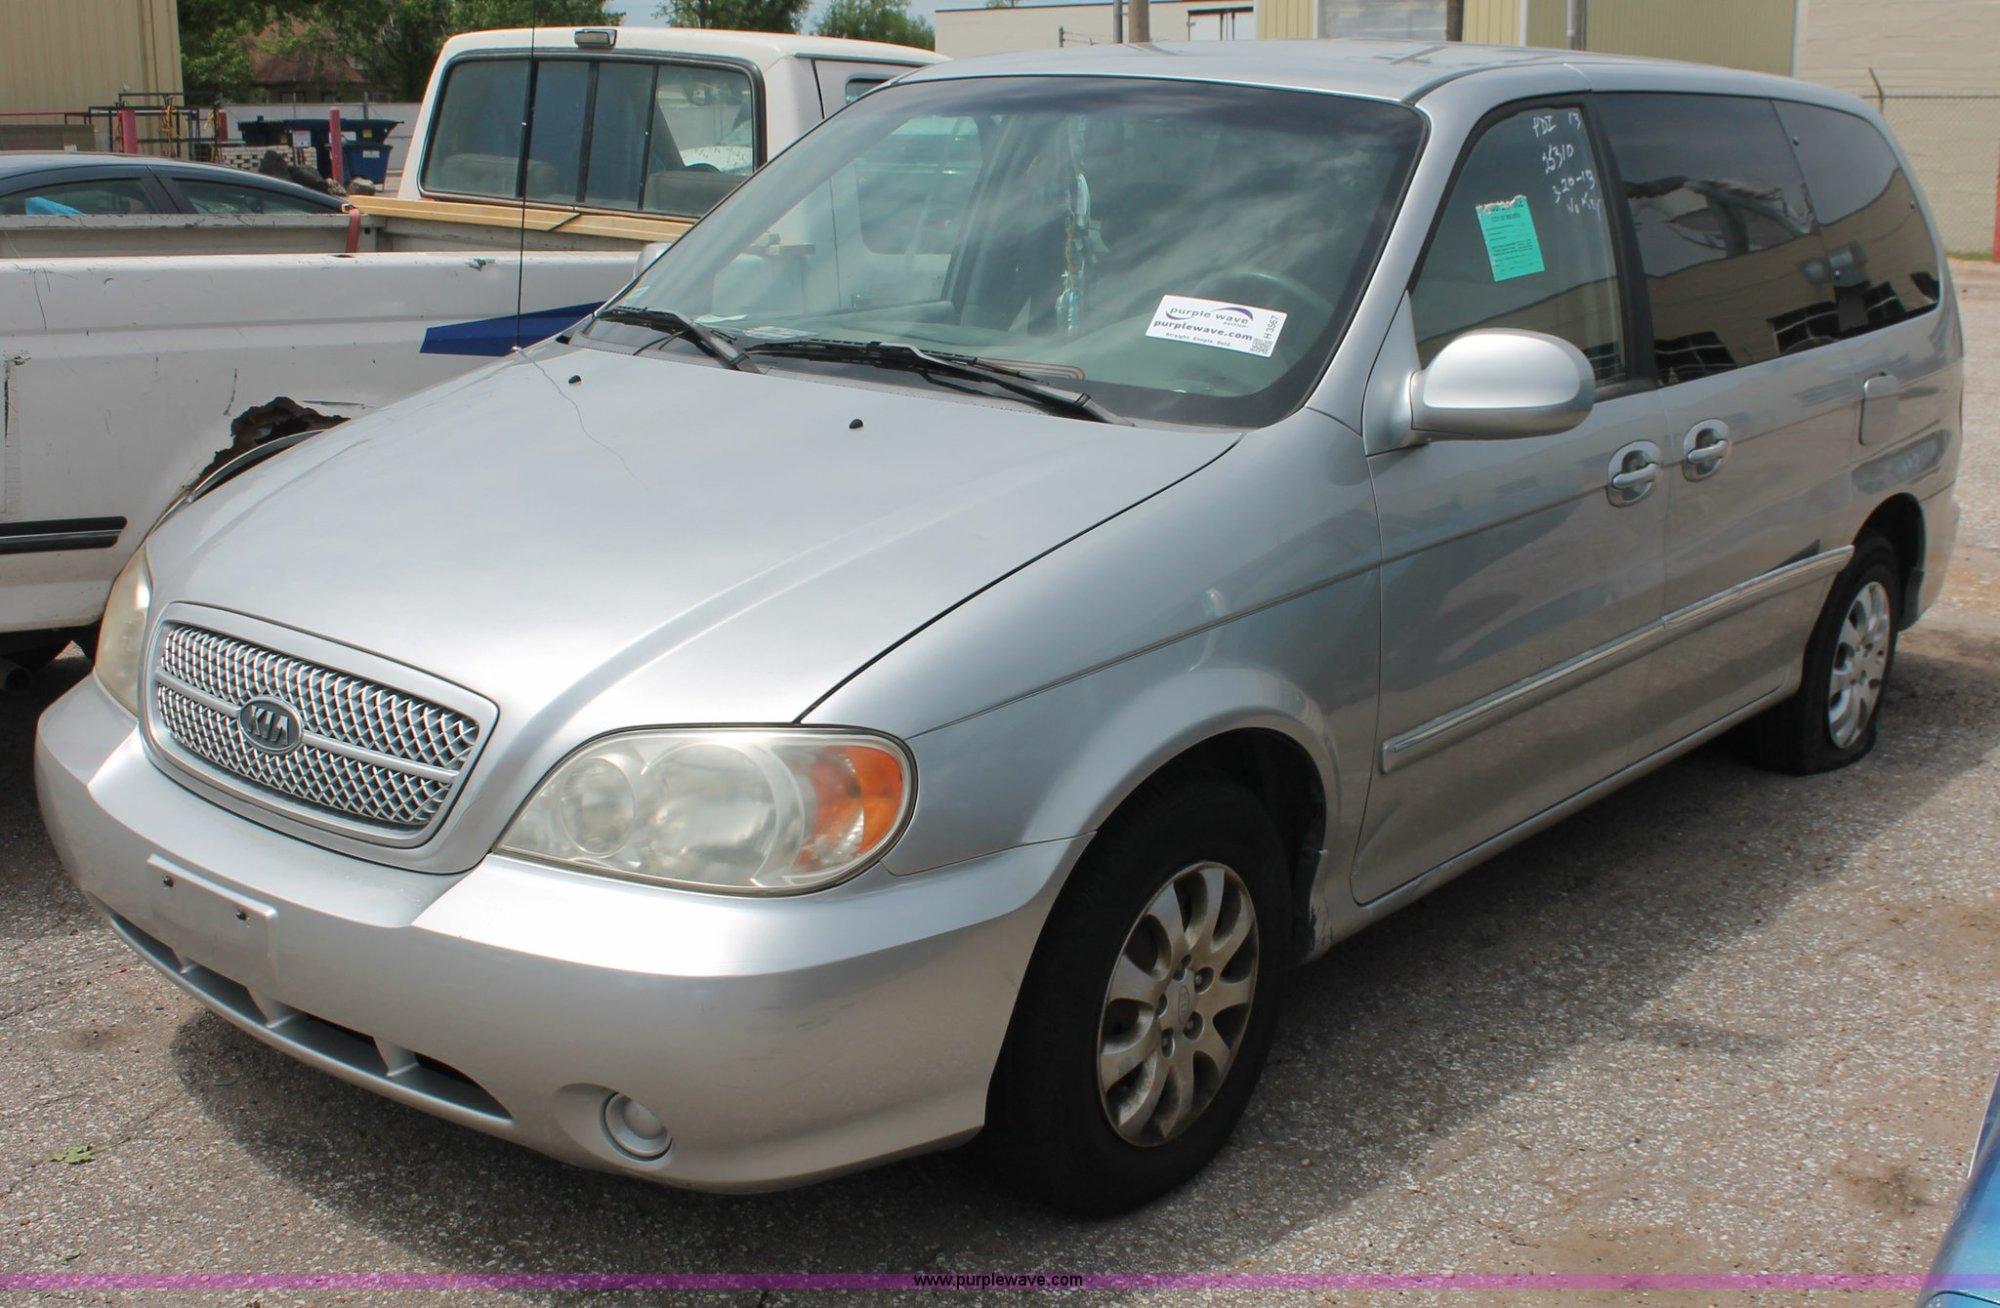 hight resolution of h3567 image for item h3567 2004 kia sedona minivan